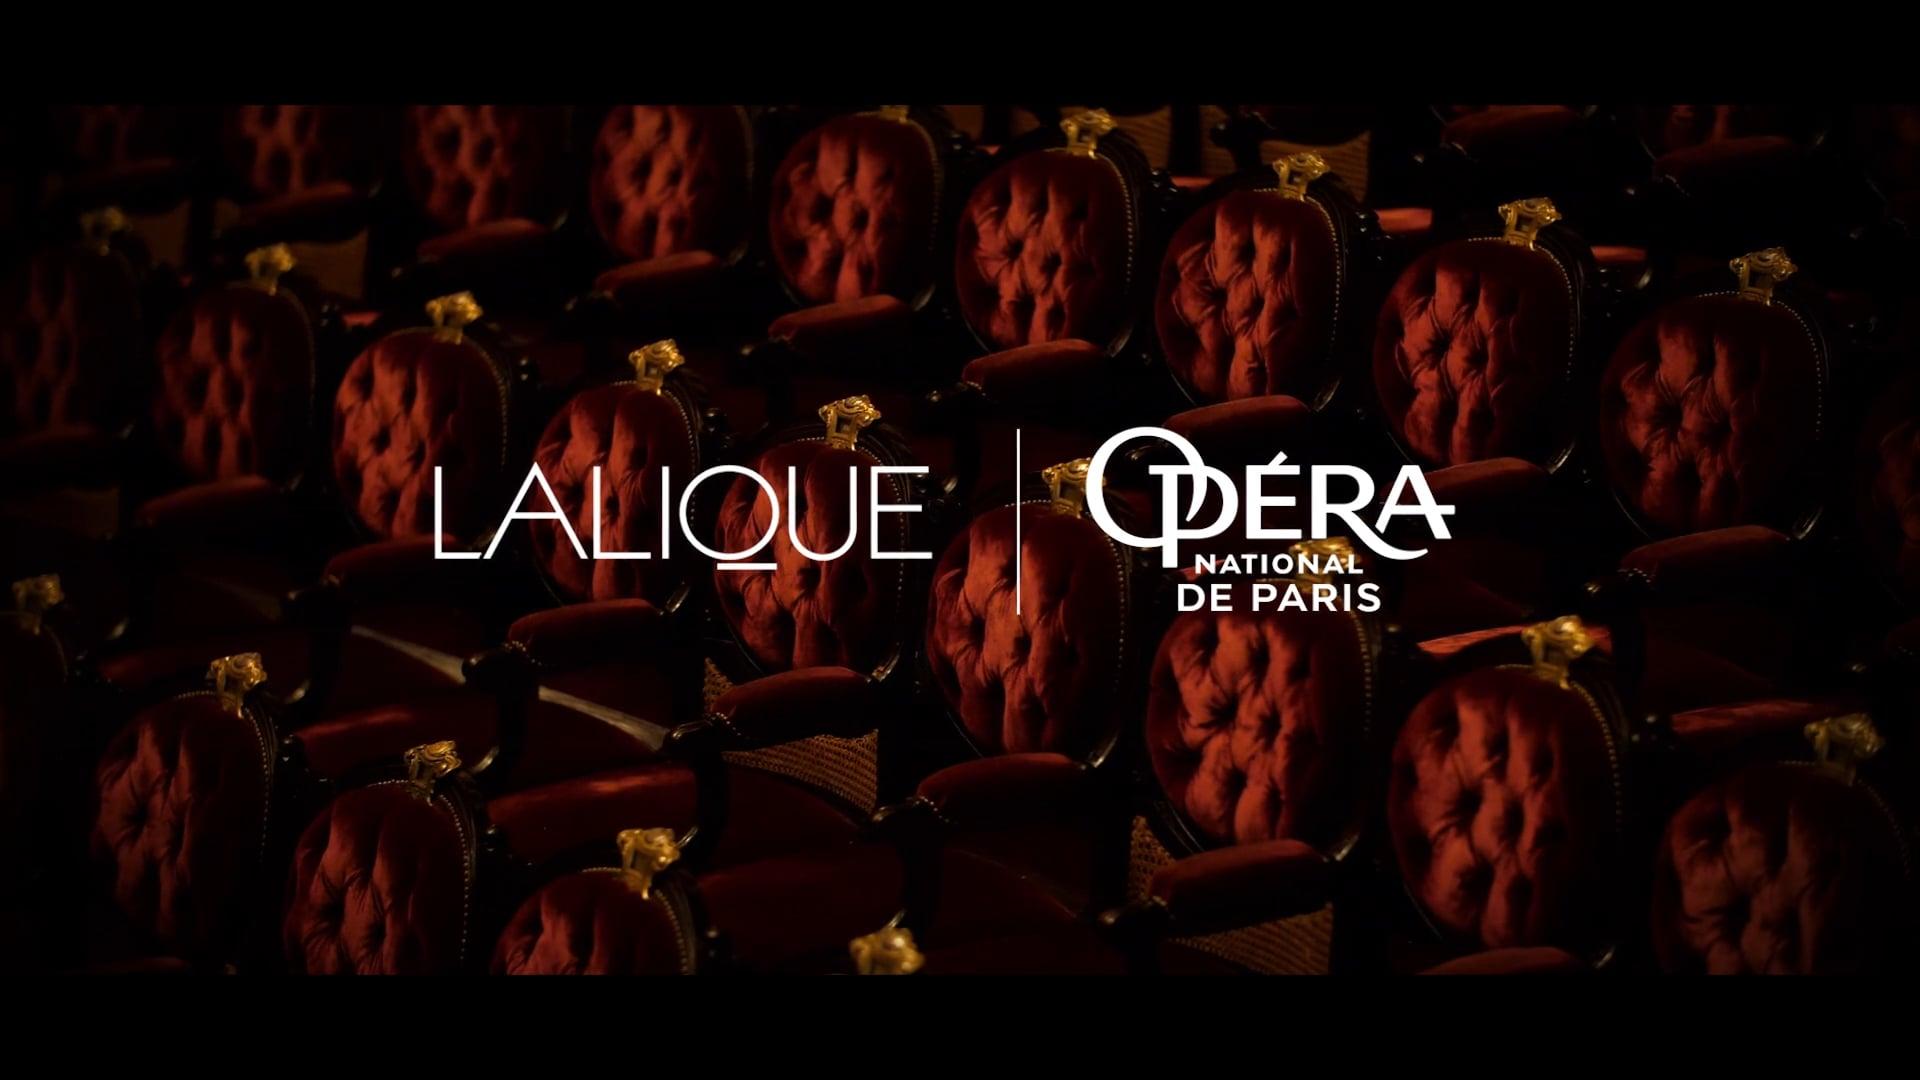 Lalique / Opera de Paris